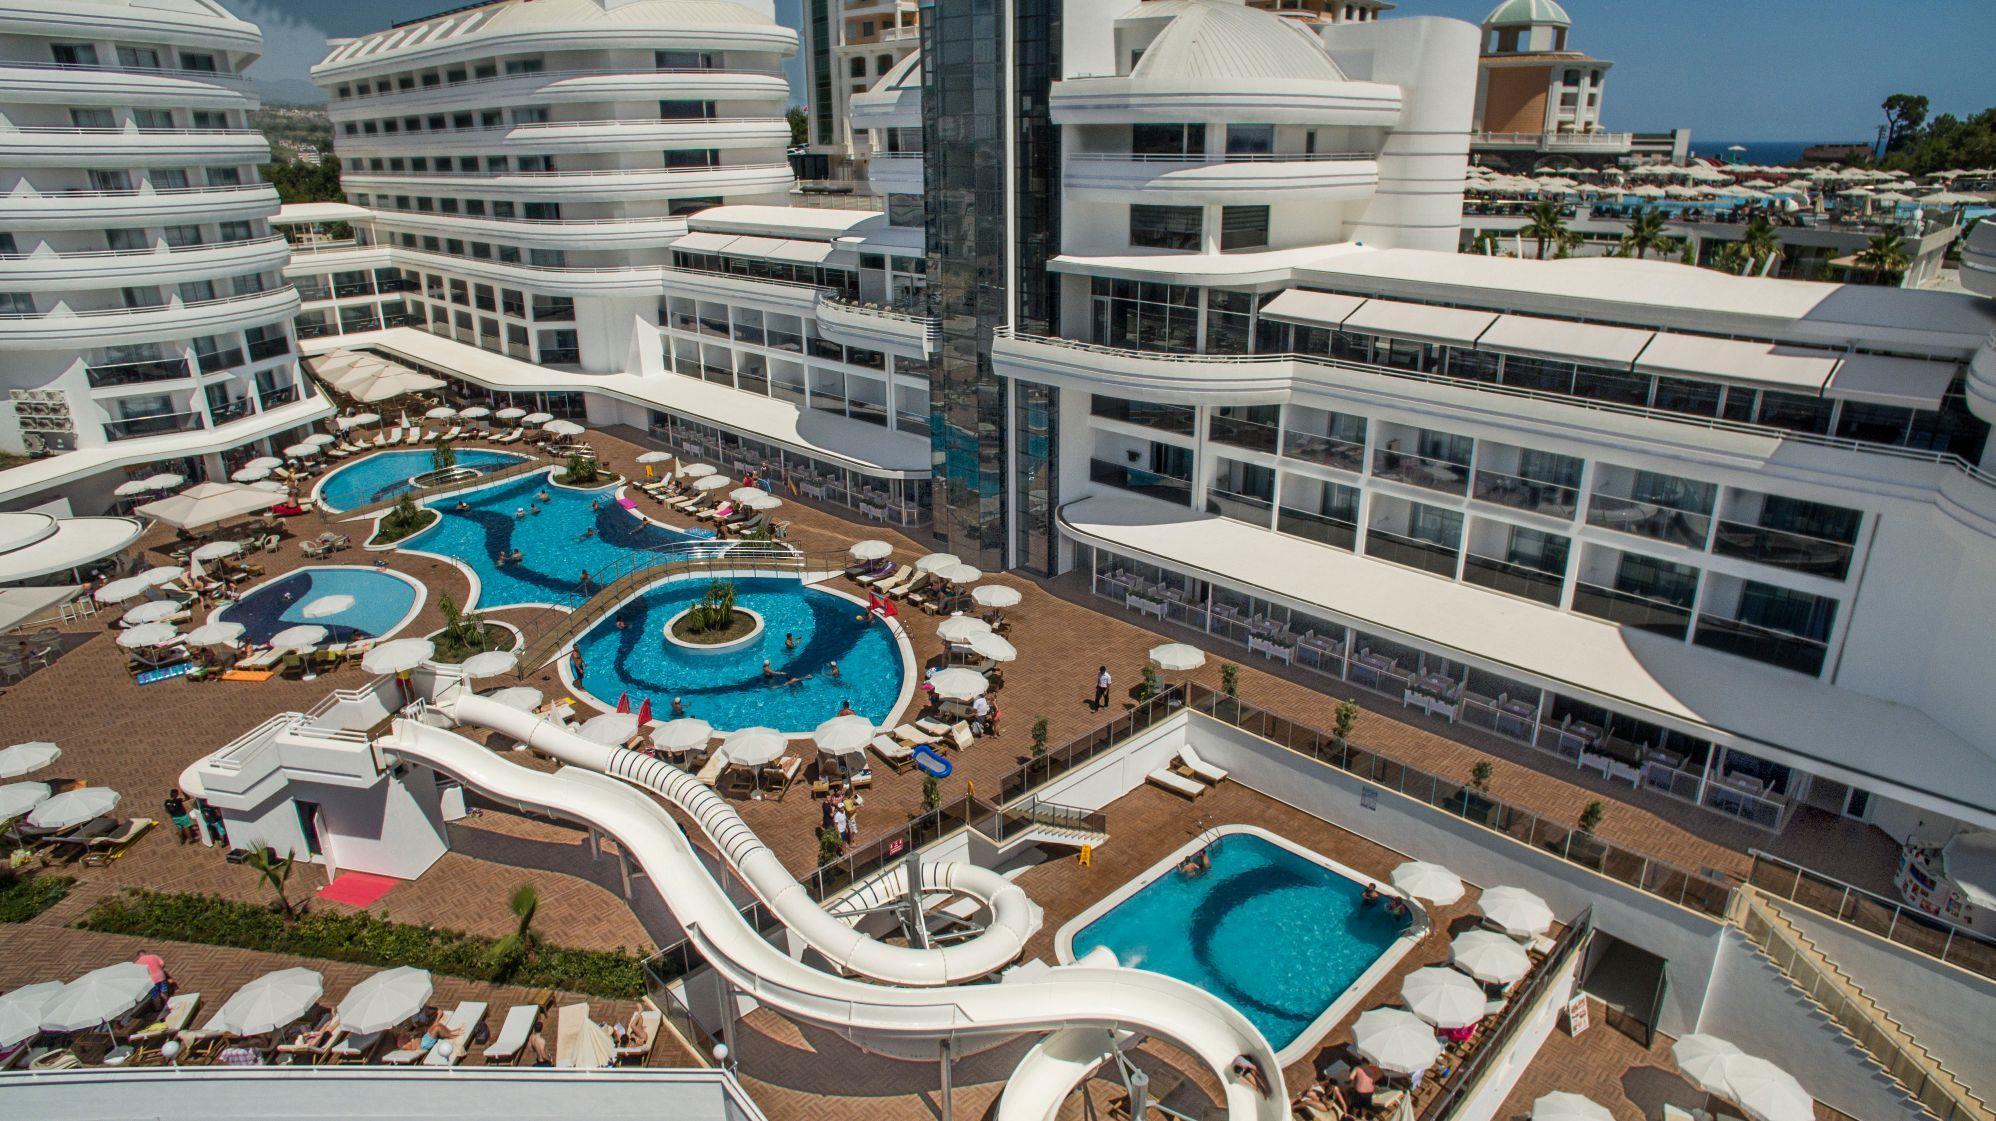 http://www.orextravel.sk/OREX/hotelphotos/laguna-beach-alya-general-004.jpg